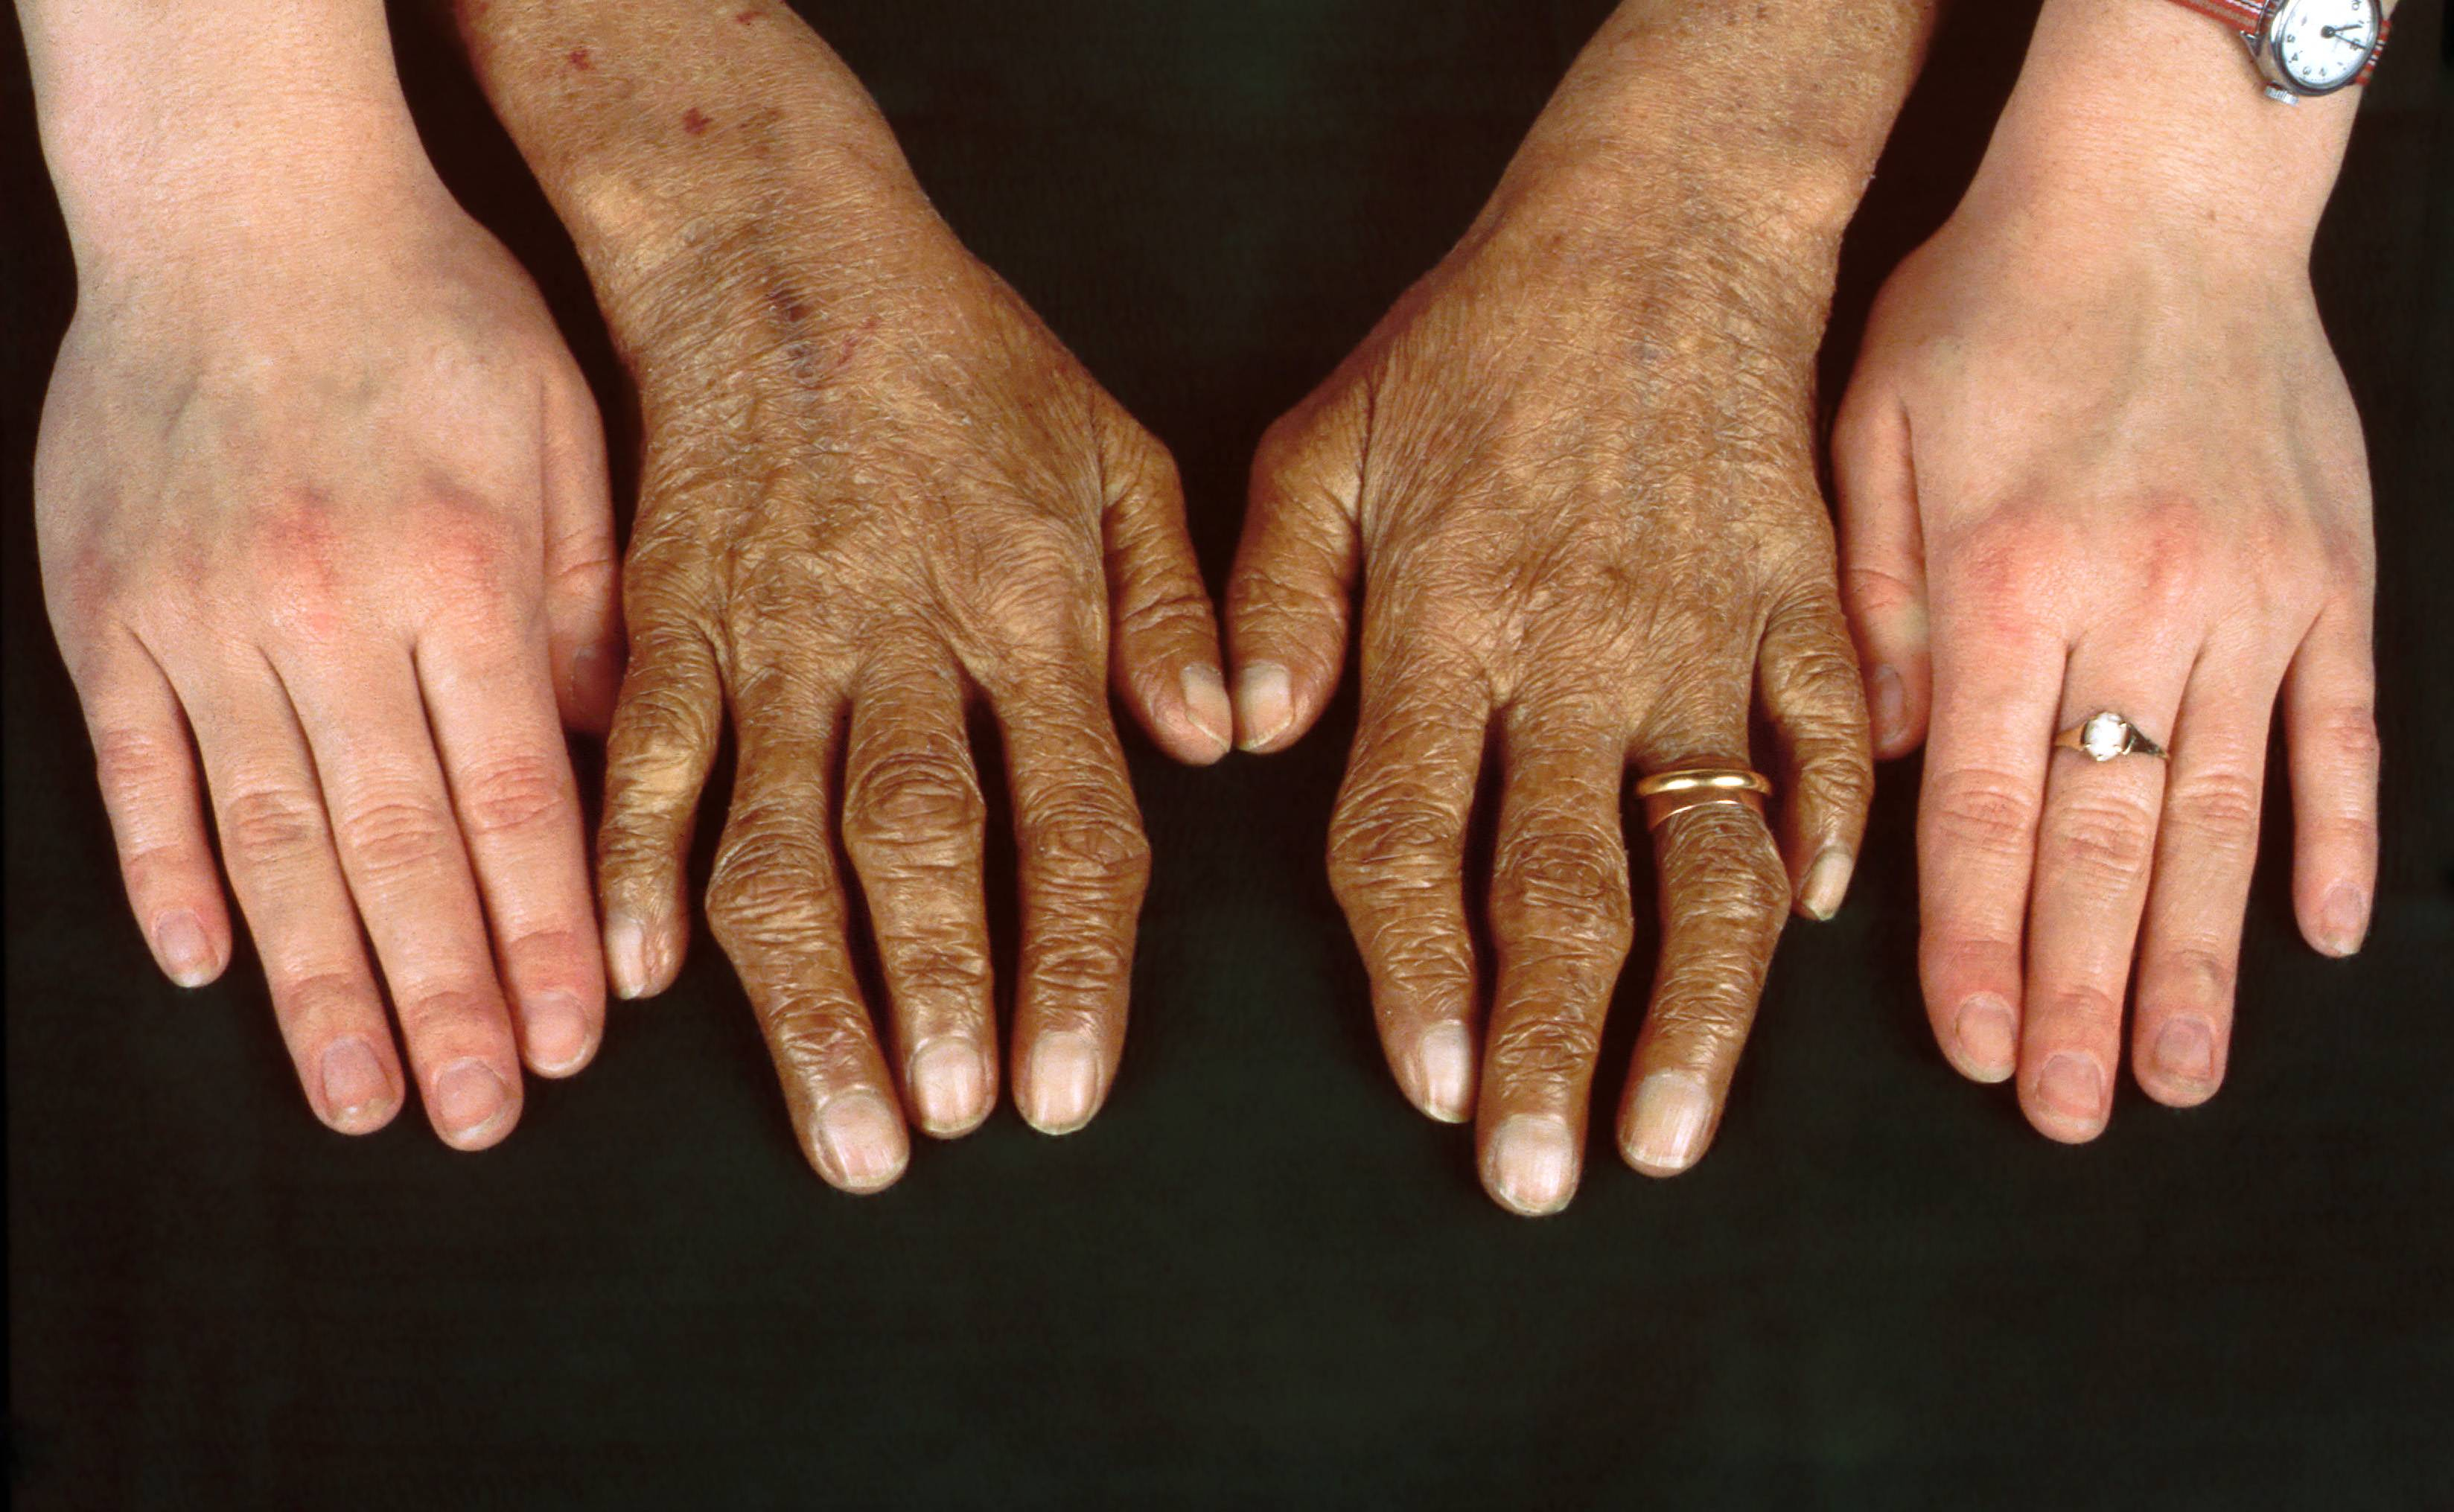 Симптомы болезни печени. заболевания печени – симптомы и признаки болезни на лице, на коже